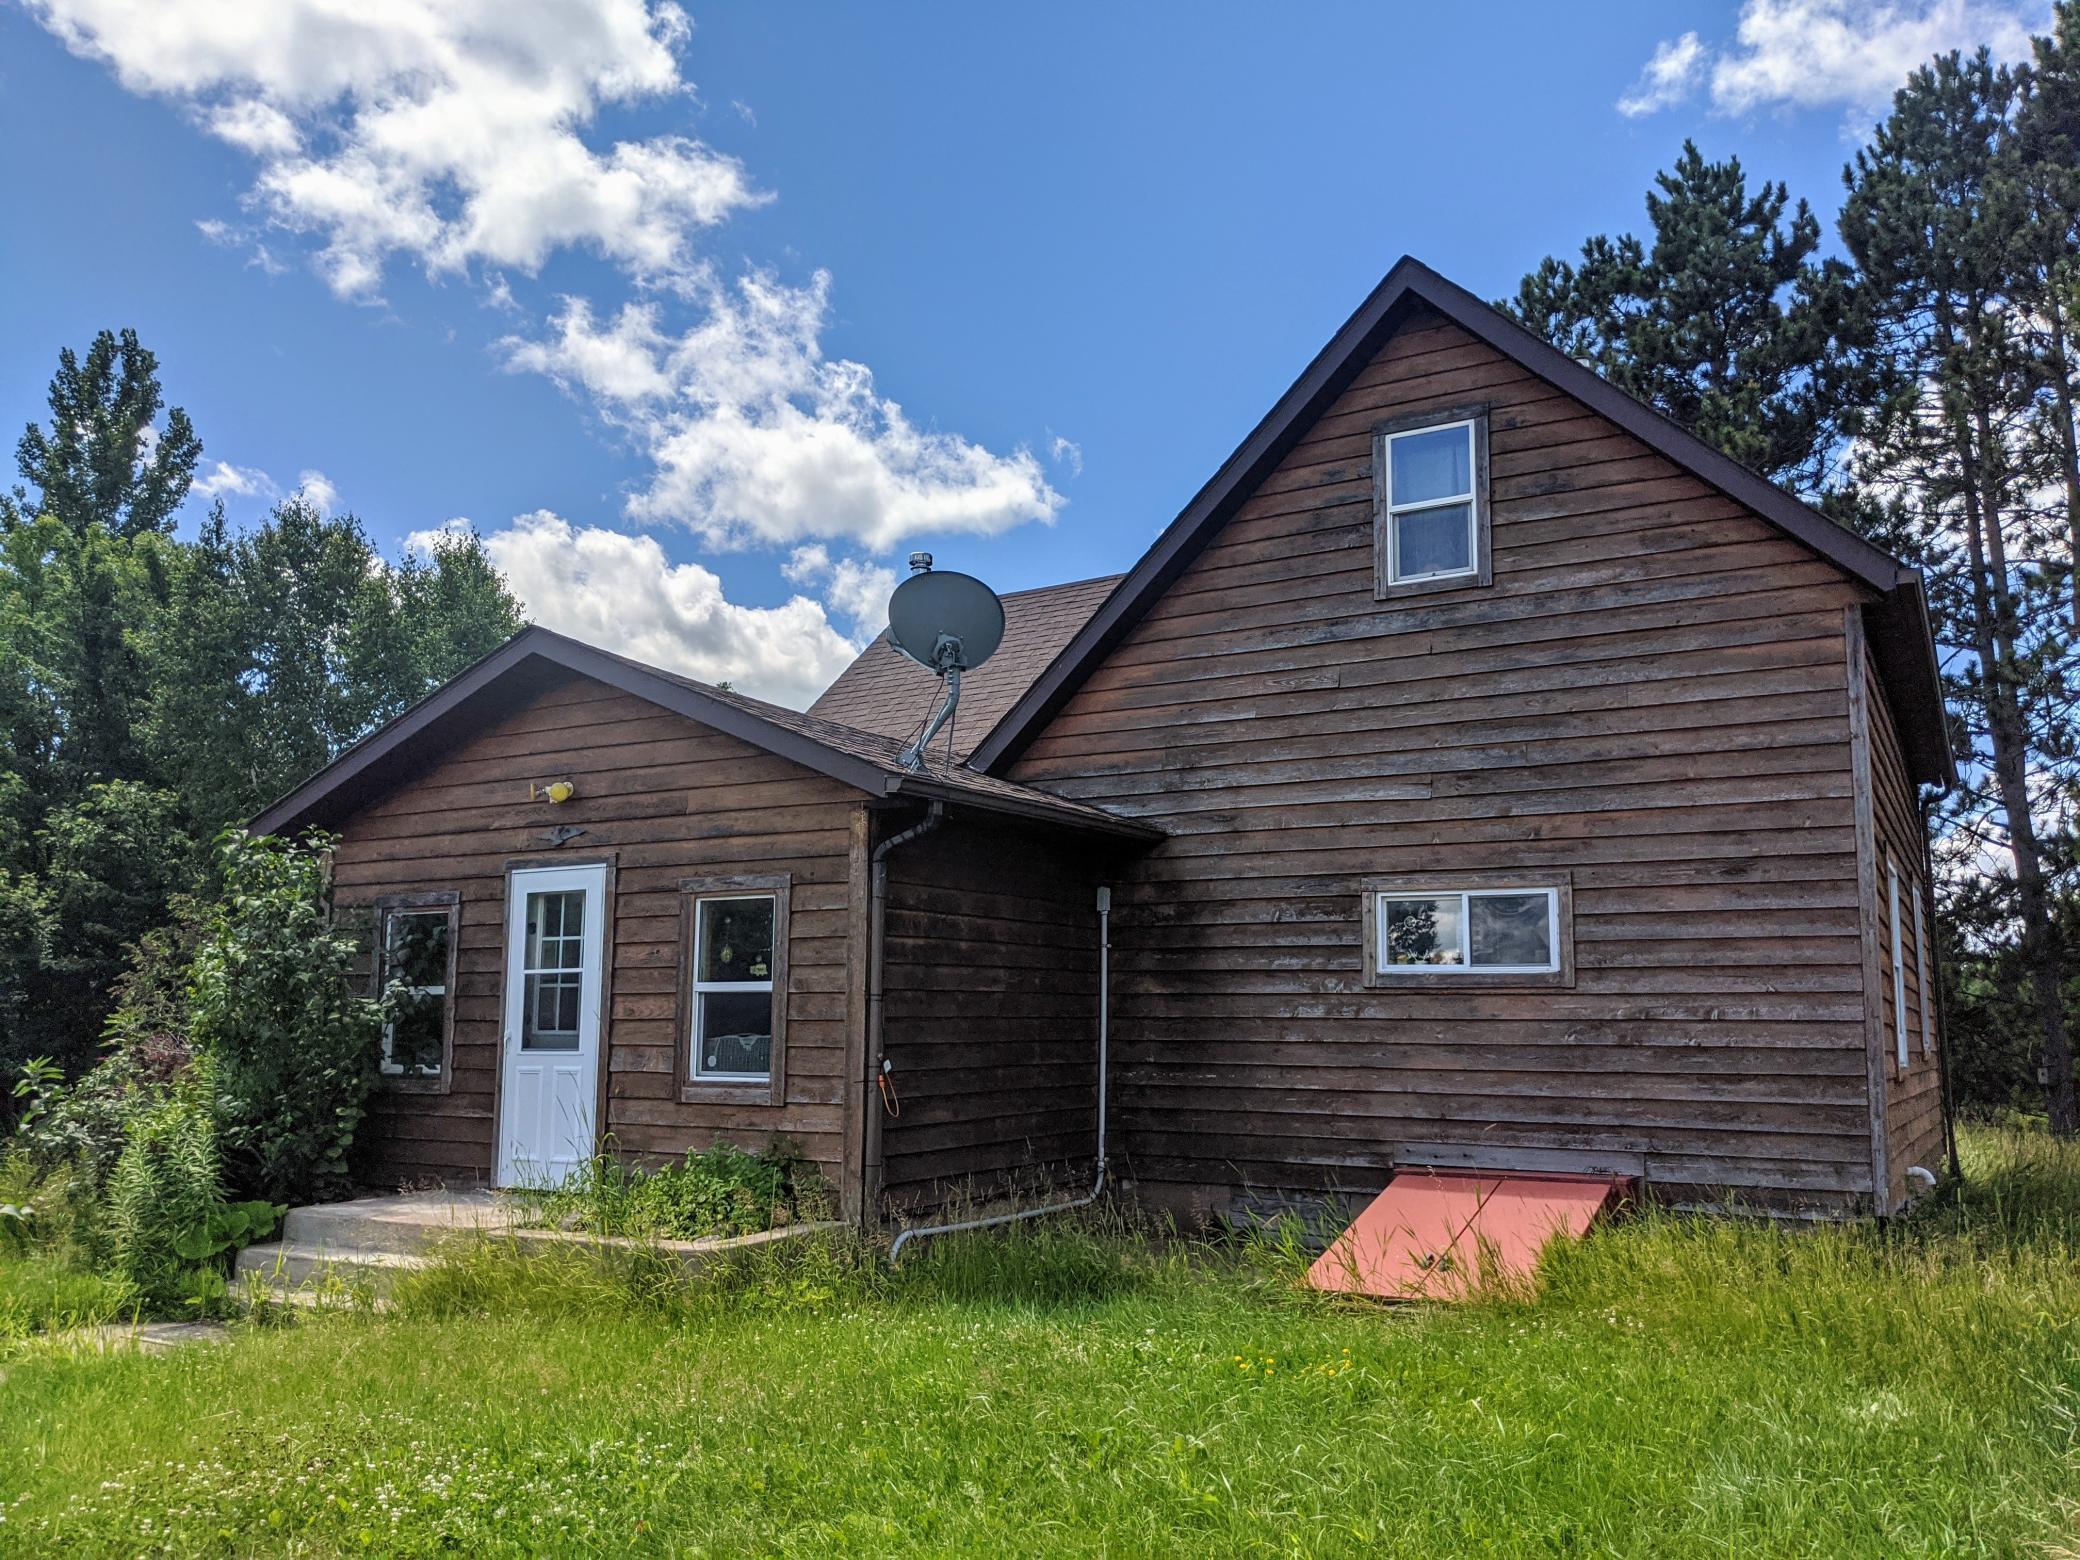 65397 Charles Lane Property Photo - Finlayson, MN real estate listing